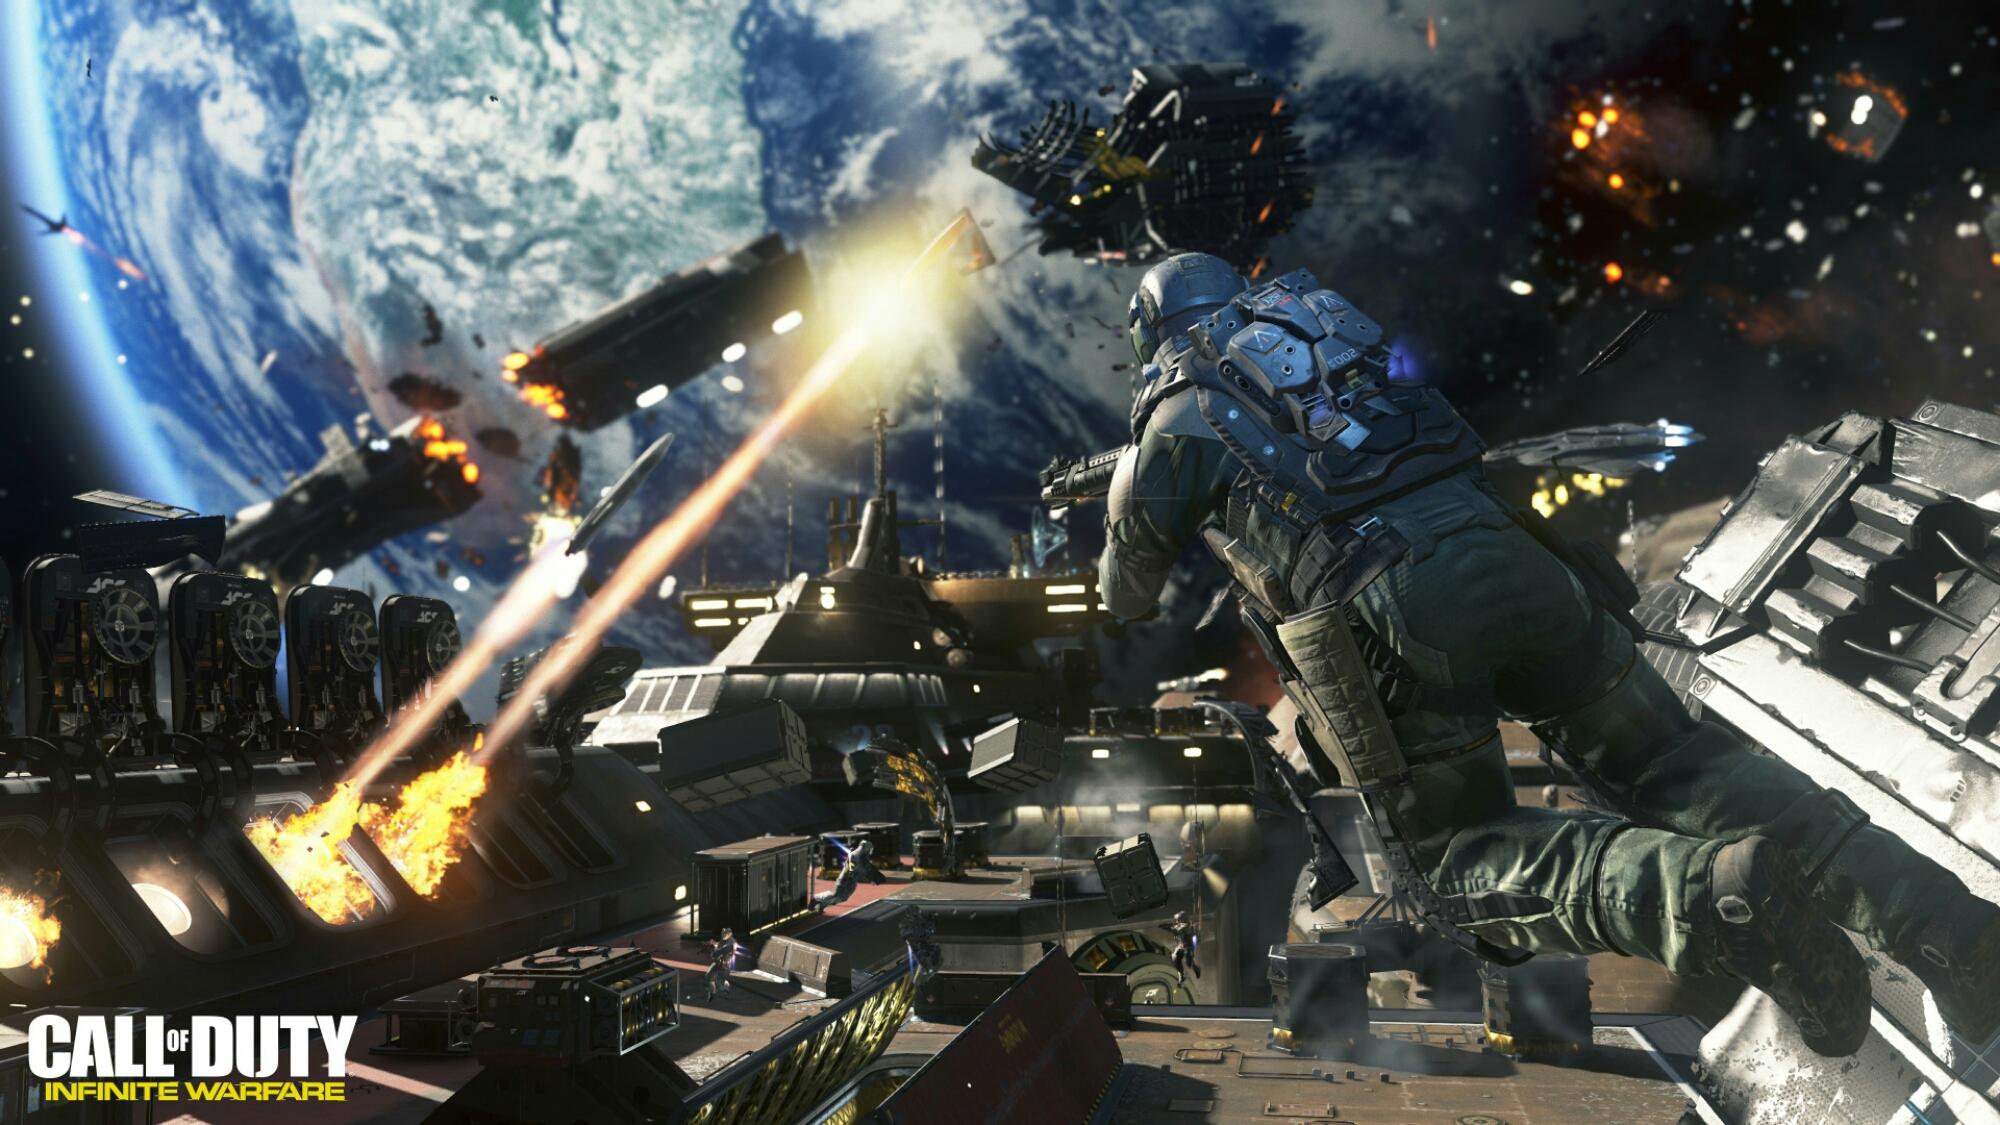 15 minutos de Call of Duty: Infinite Warfare